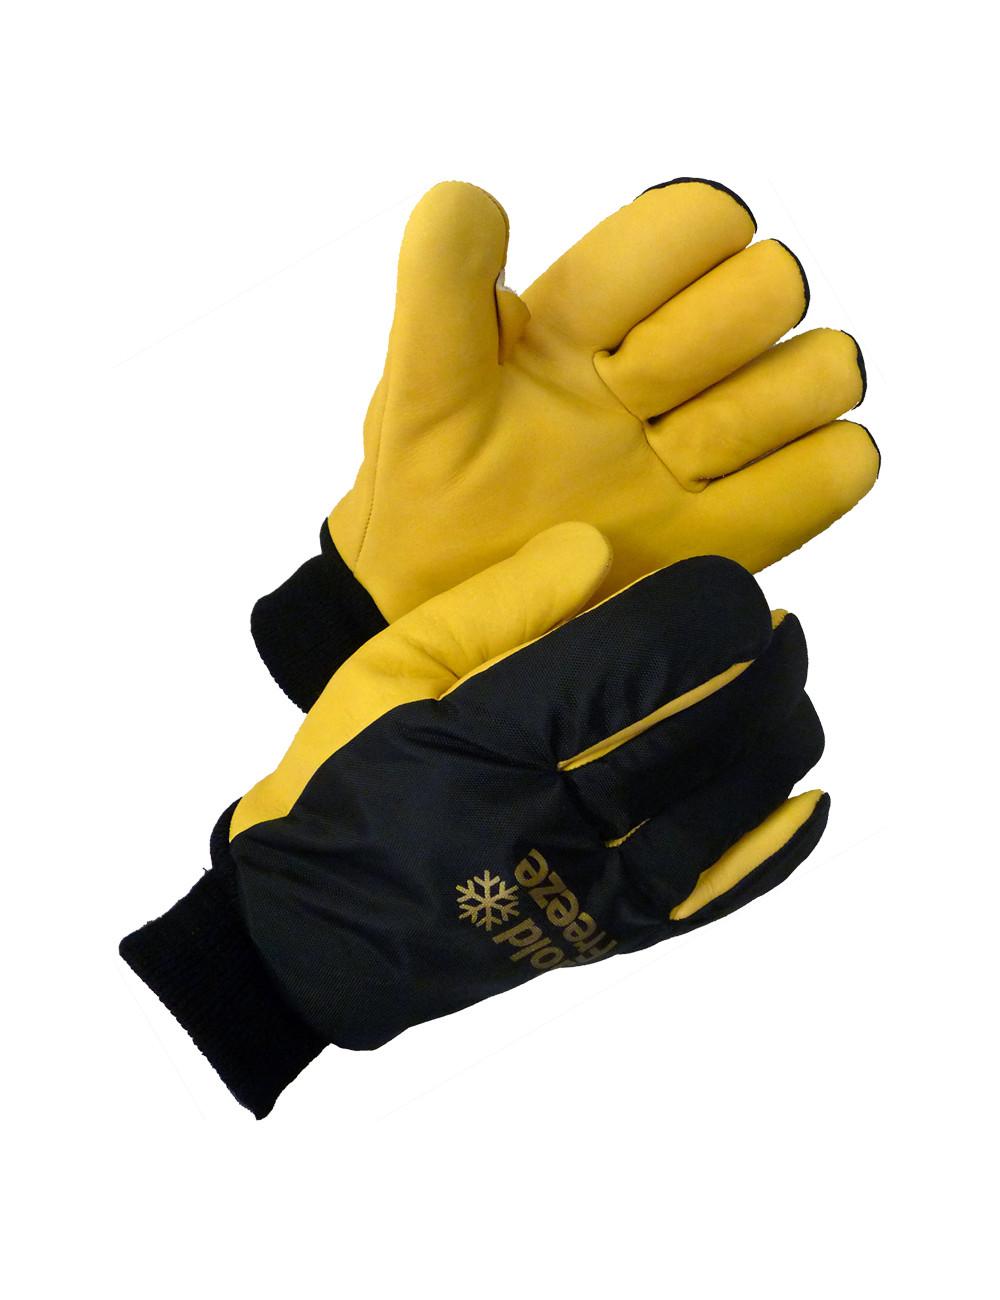 Rękawice do chłodni Polar Range Coldstore, Goldfreeze